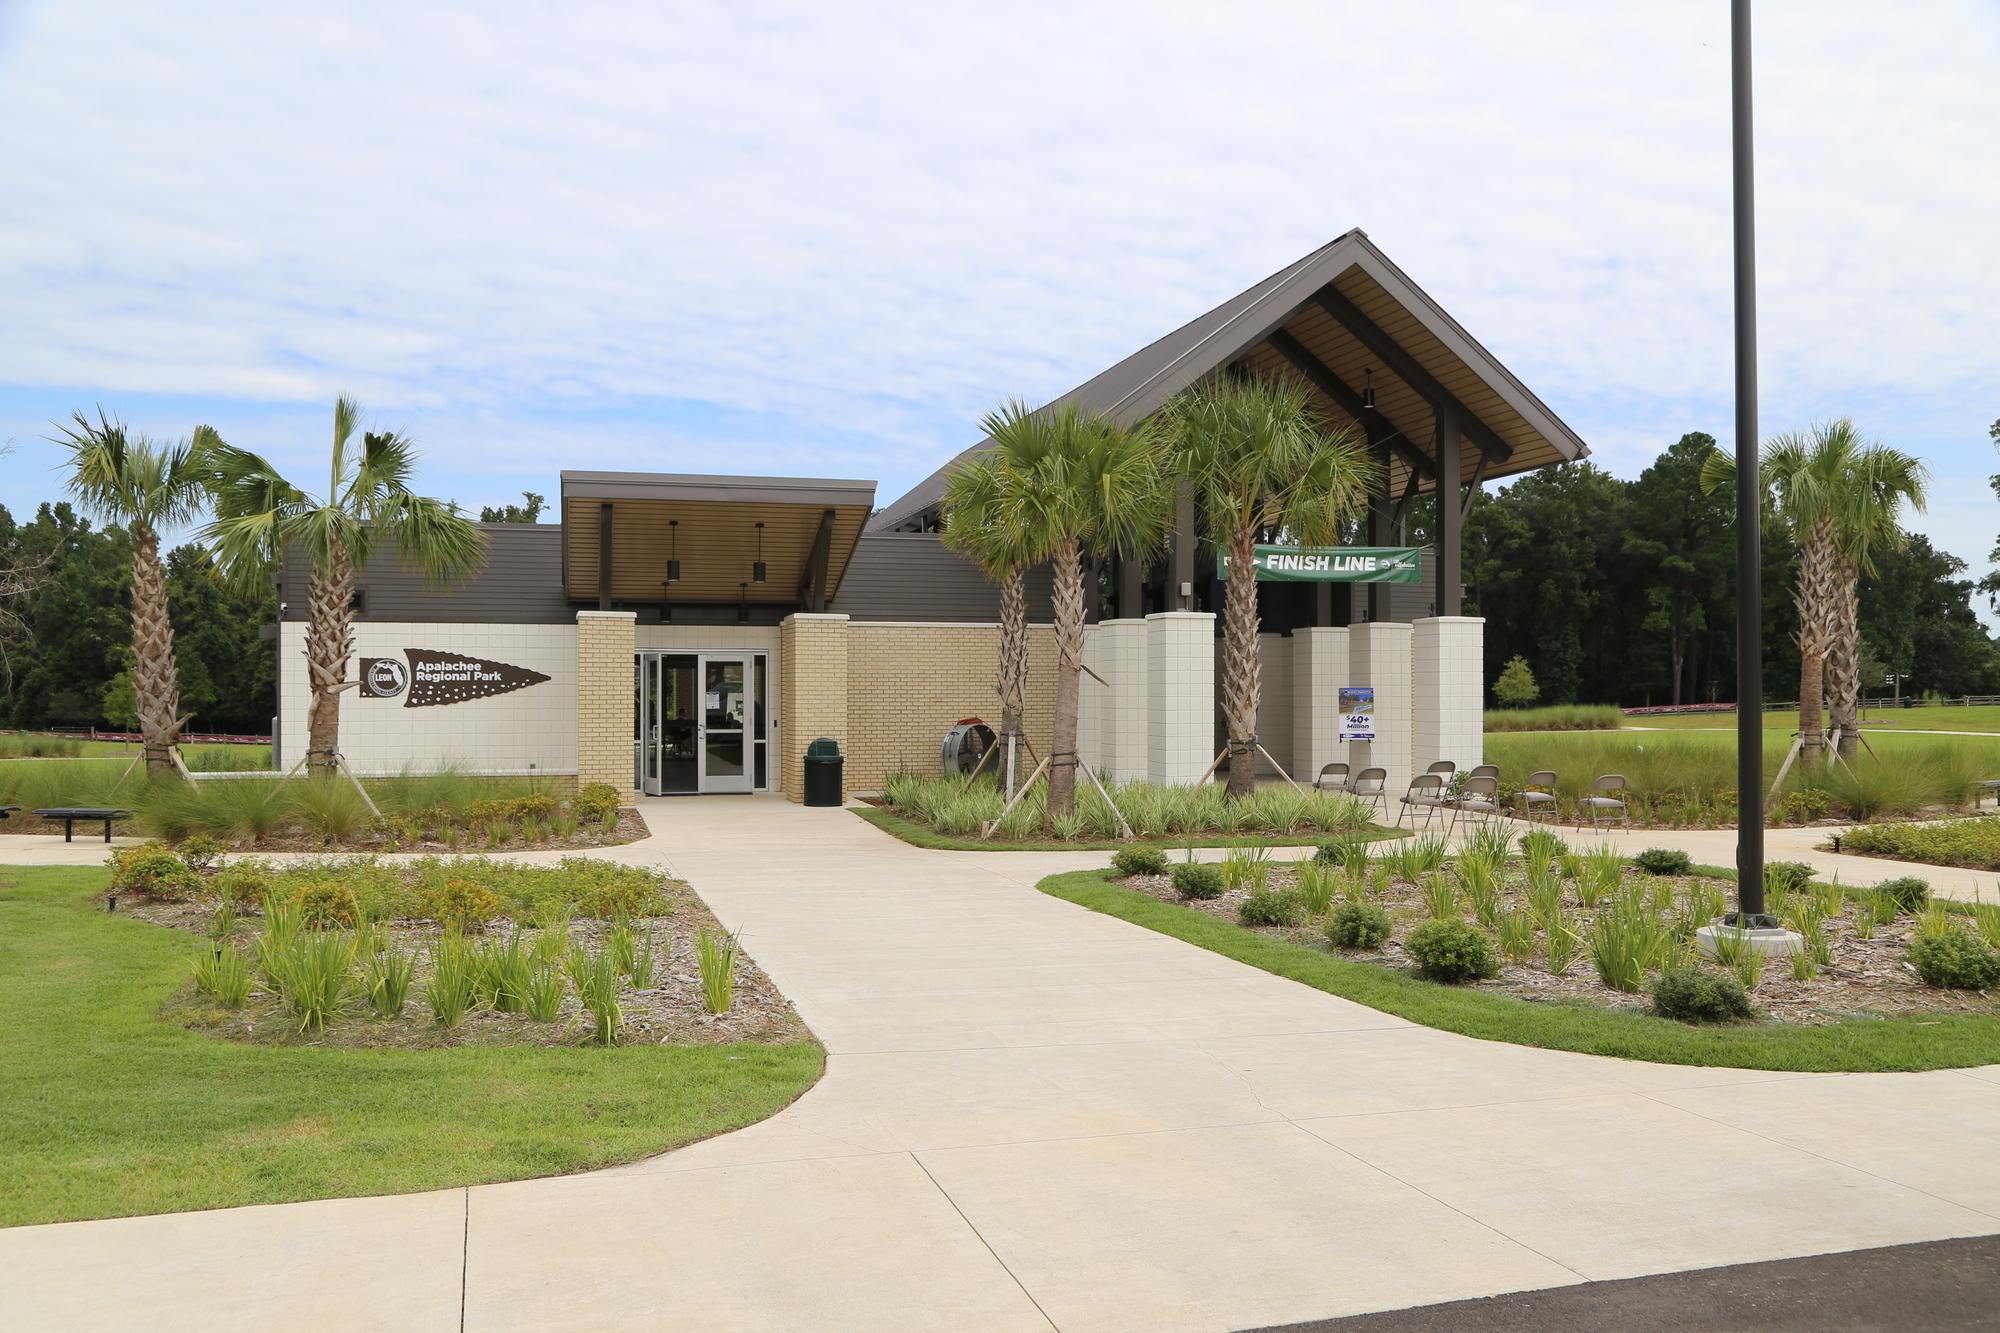 New improvements to Apalachee Regional Park